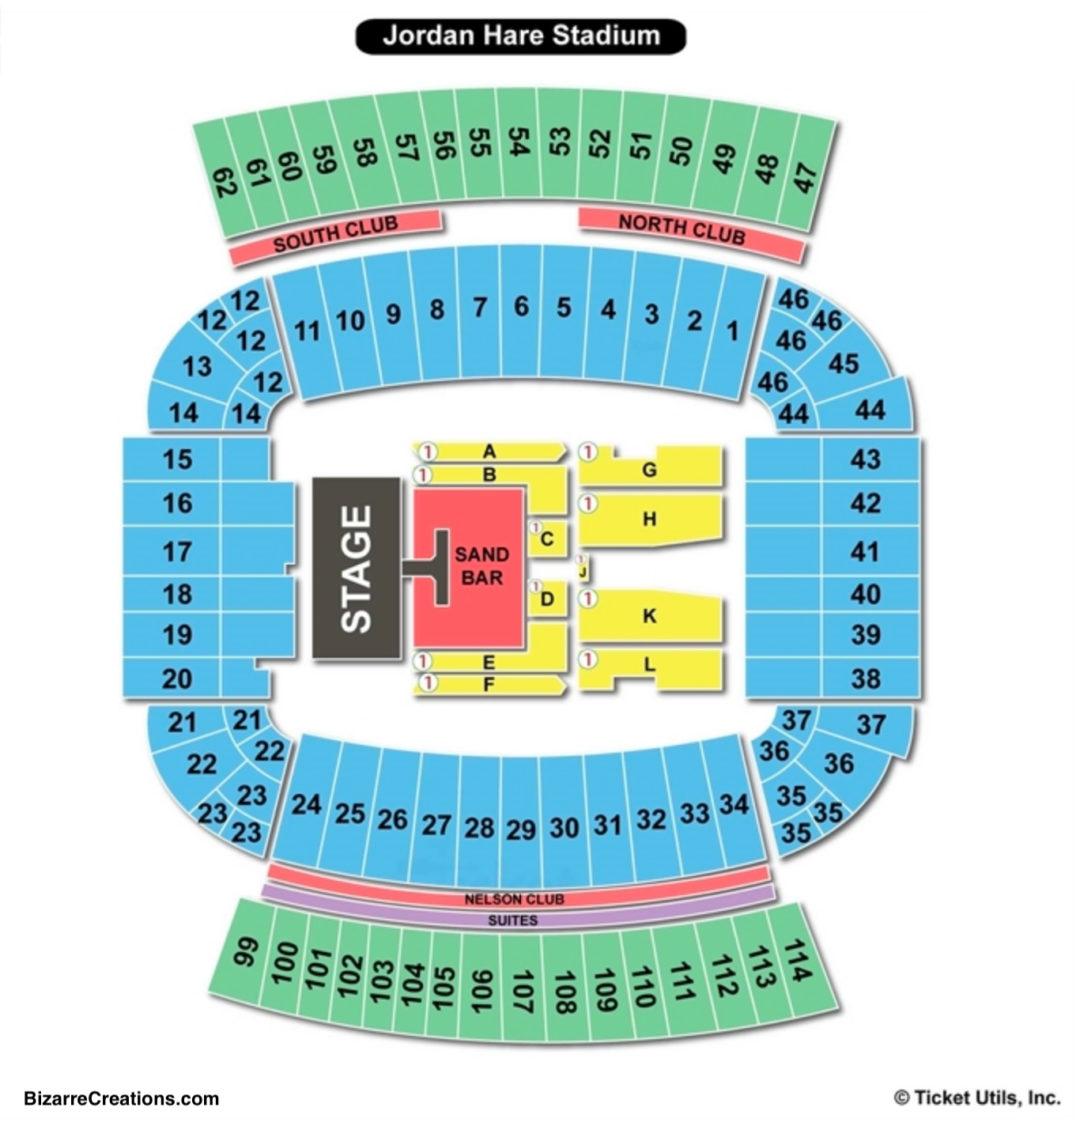 Jordan hare stadium seating chart seating charts tickets